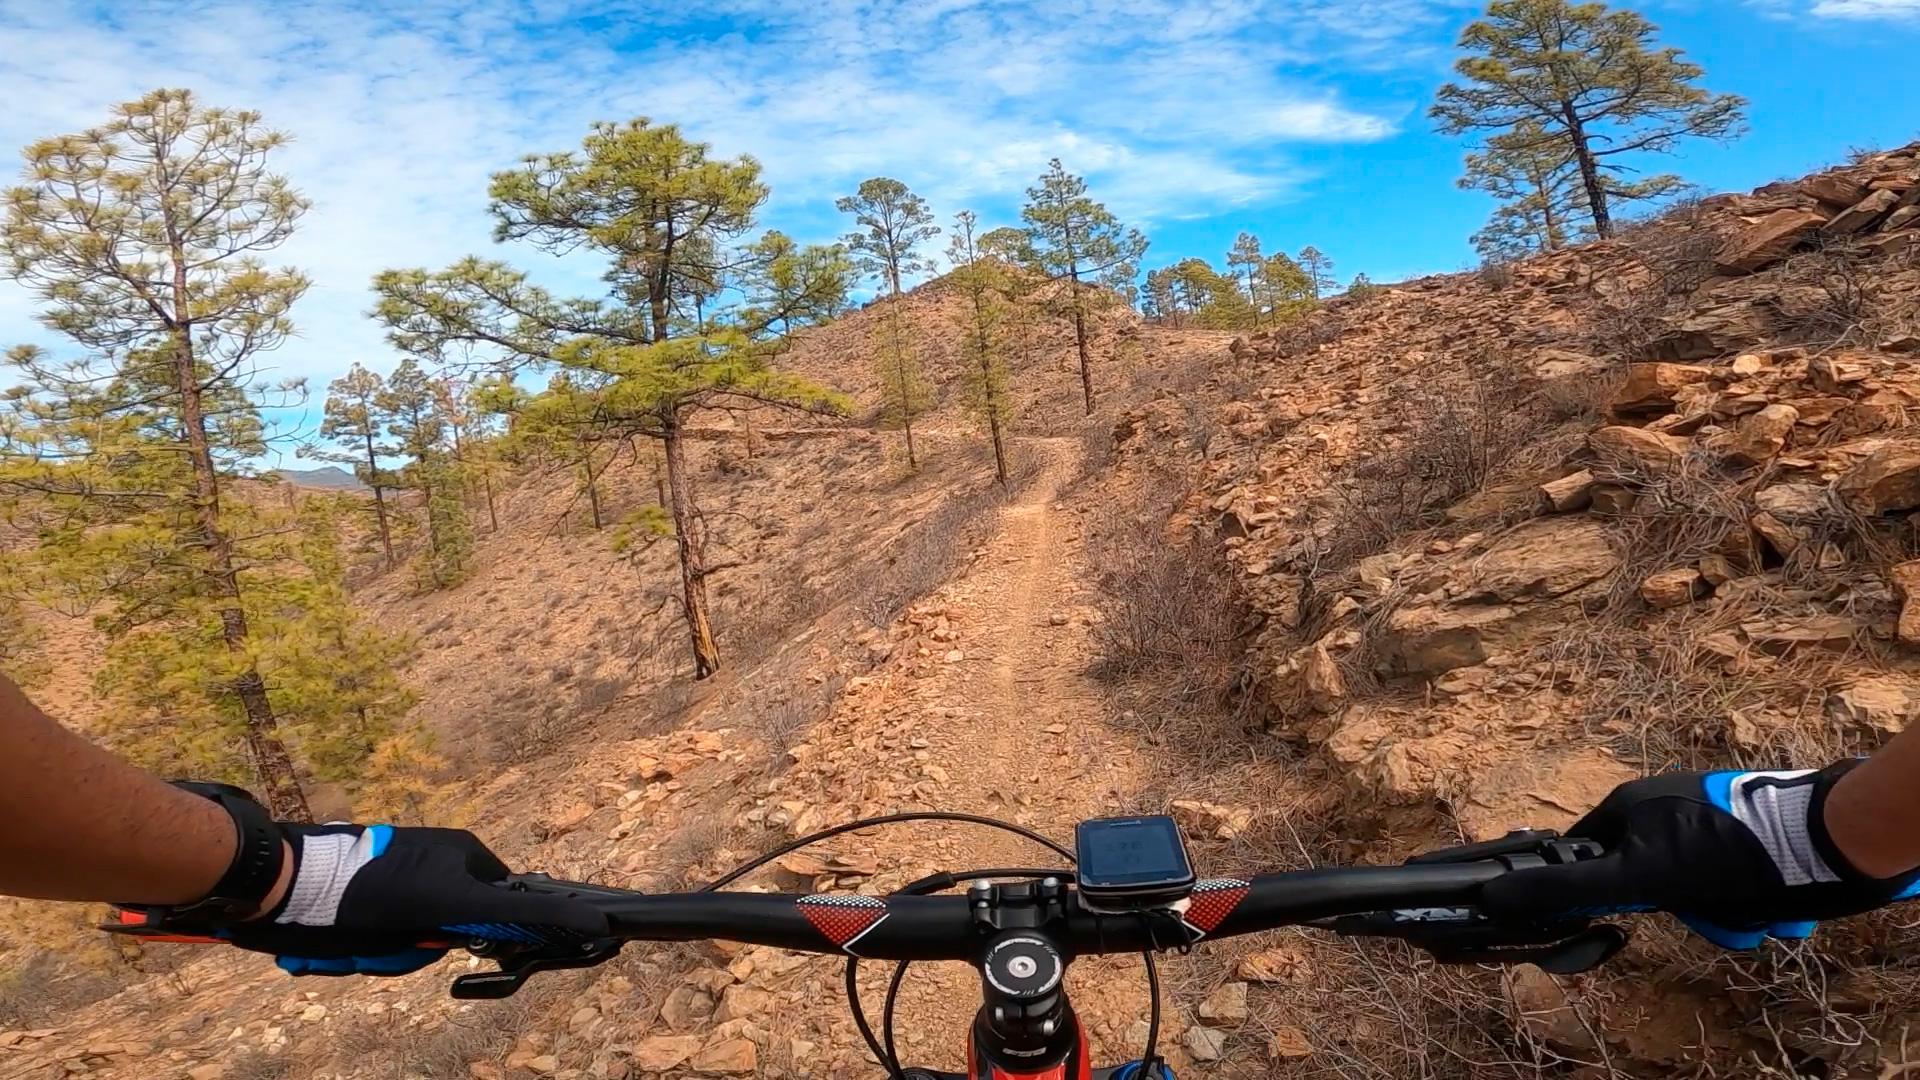 Ruta enduro MtB: Barranquillo de los Frailes - Cortadores